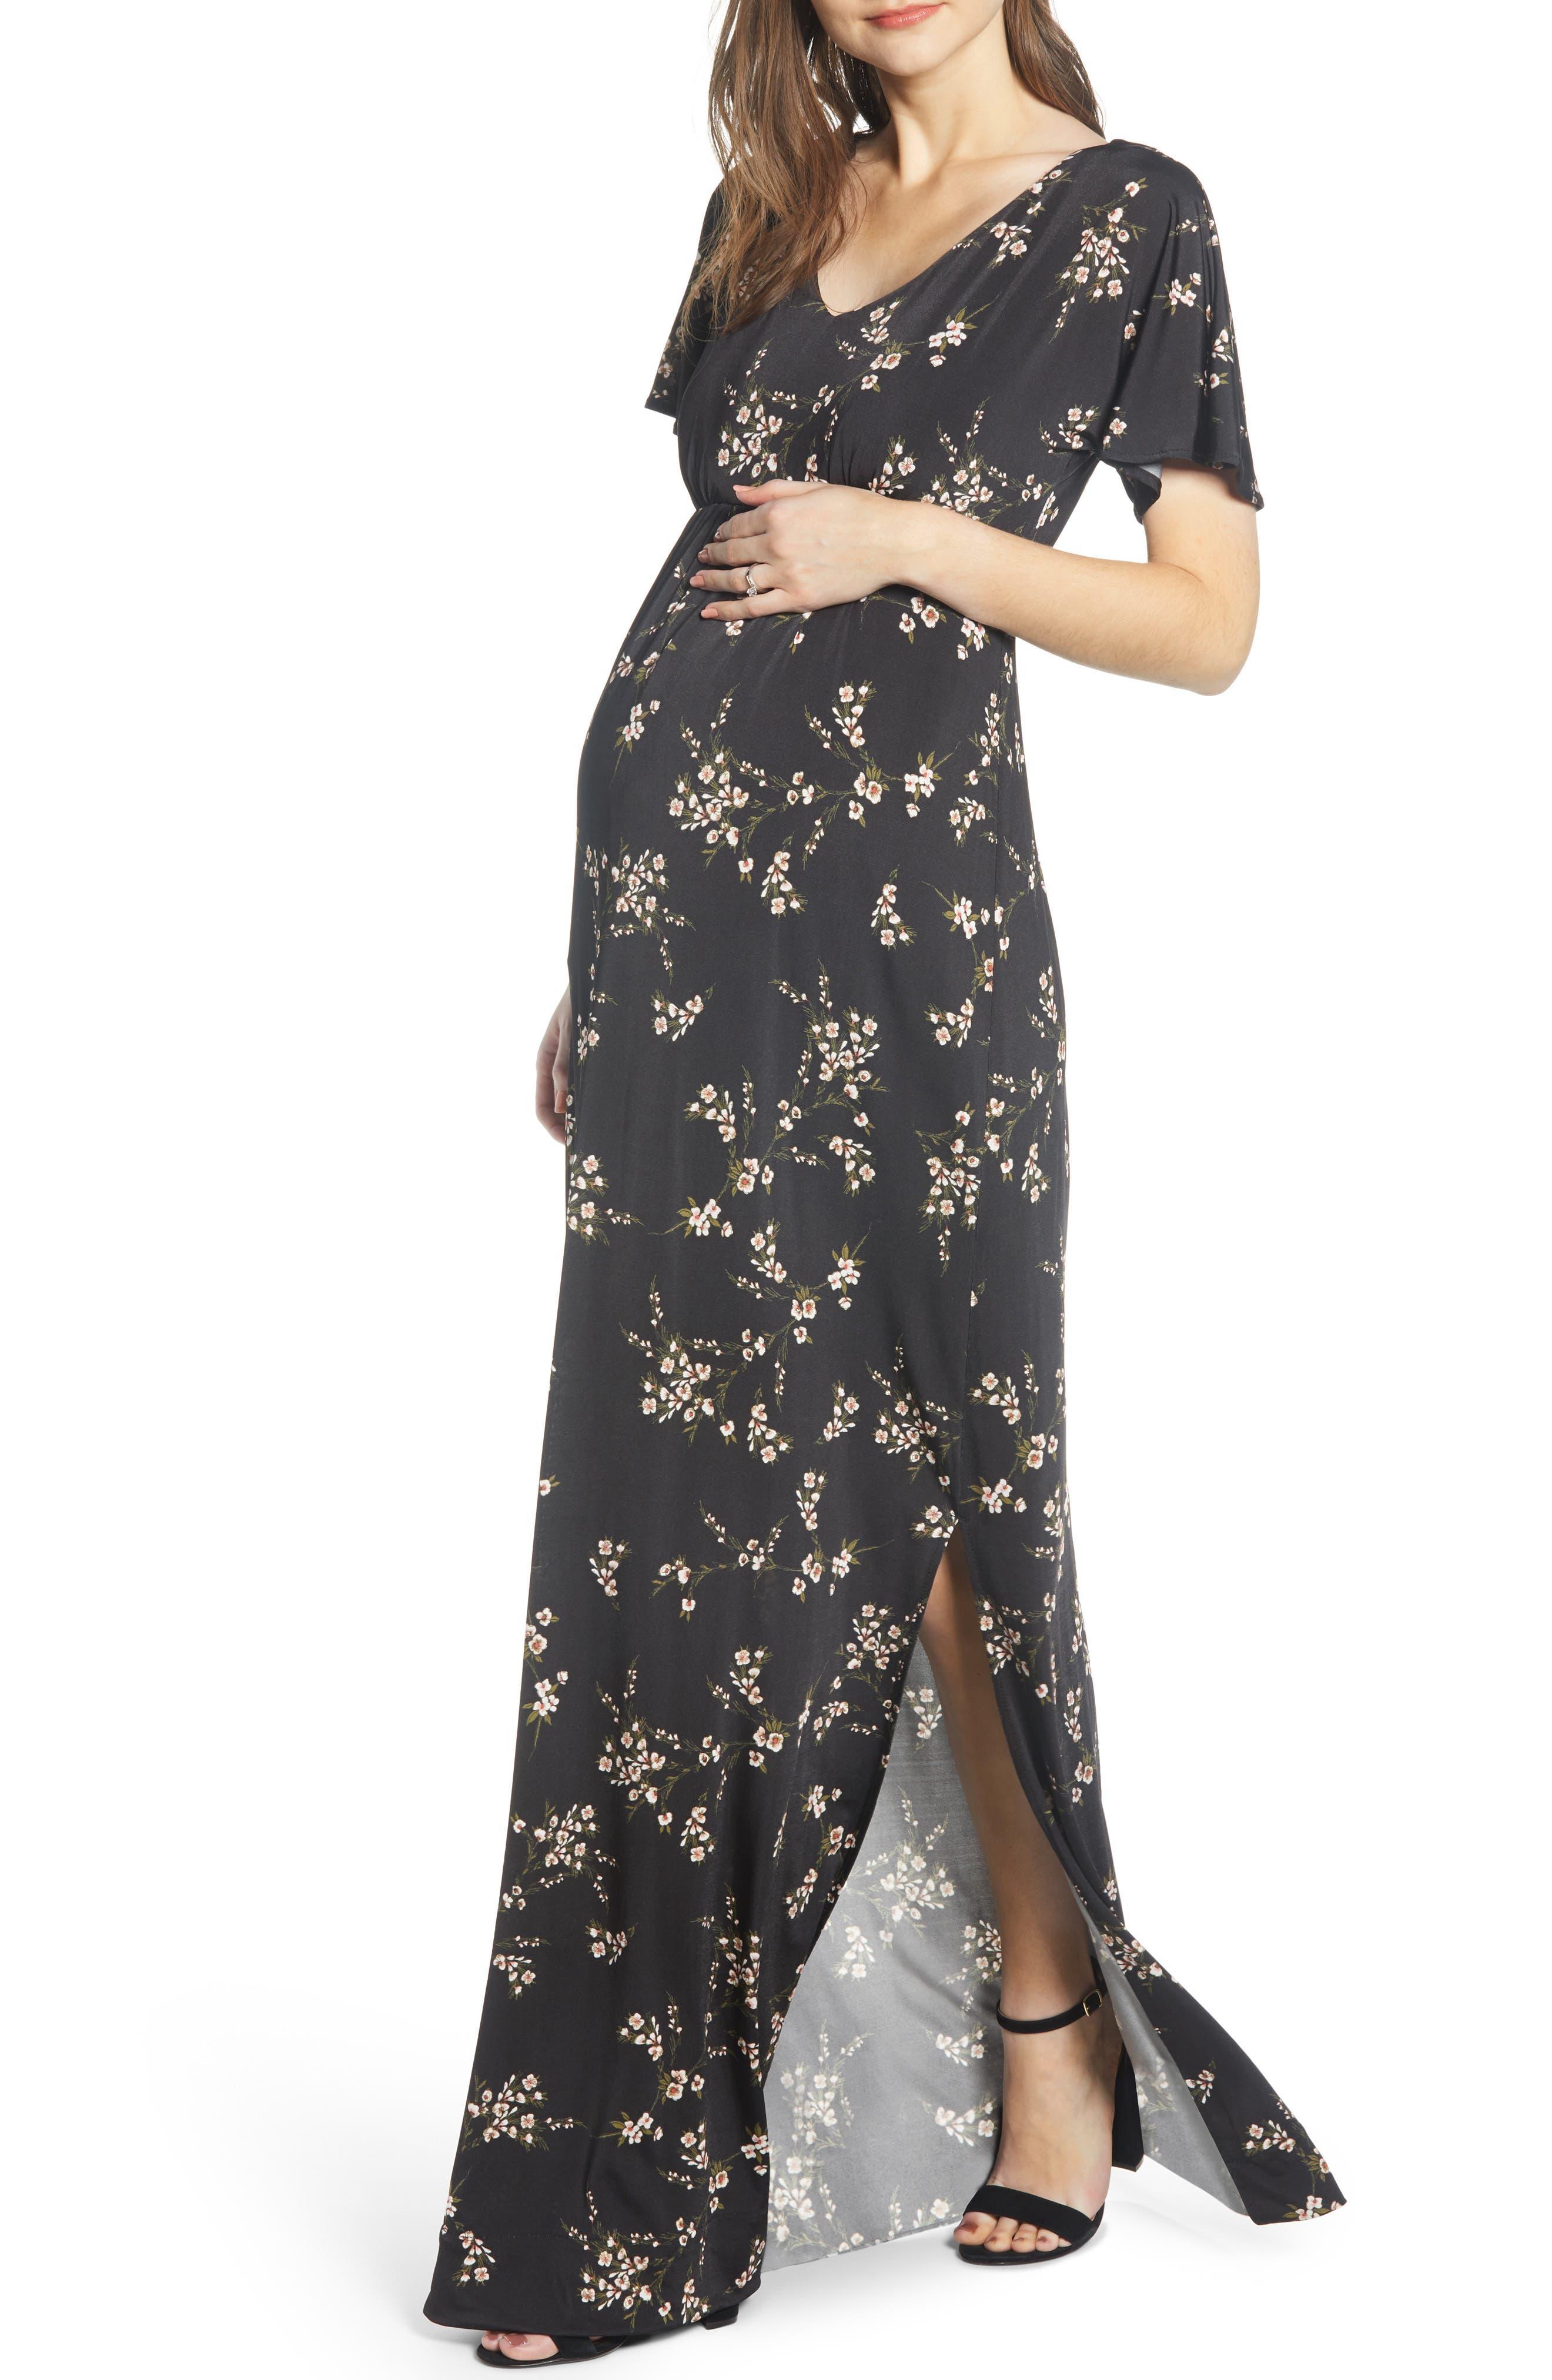 Tiffany Rose Floral Maternity Maxi Dress, Black